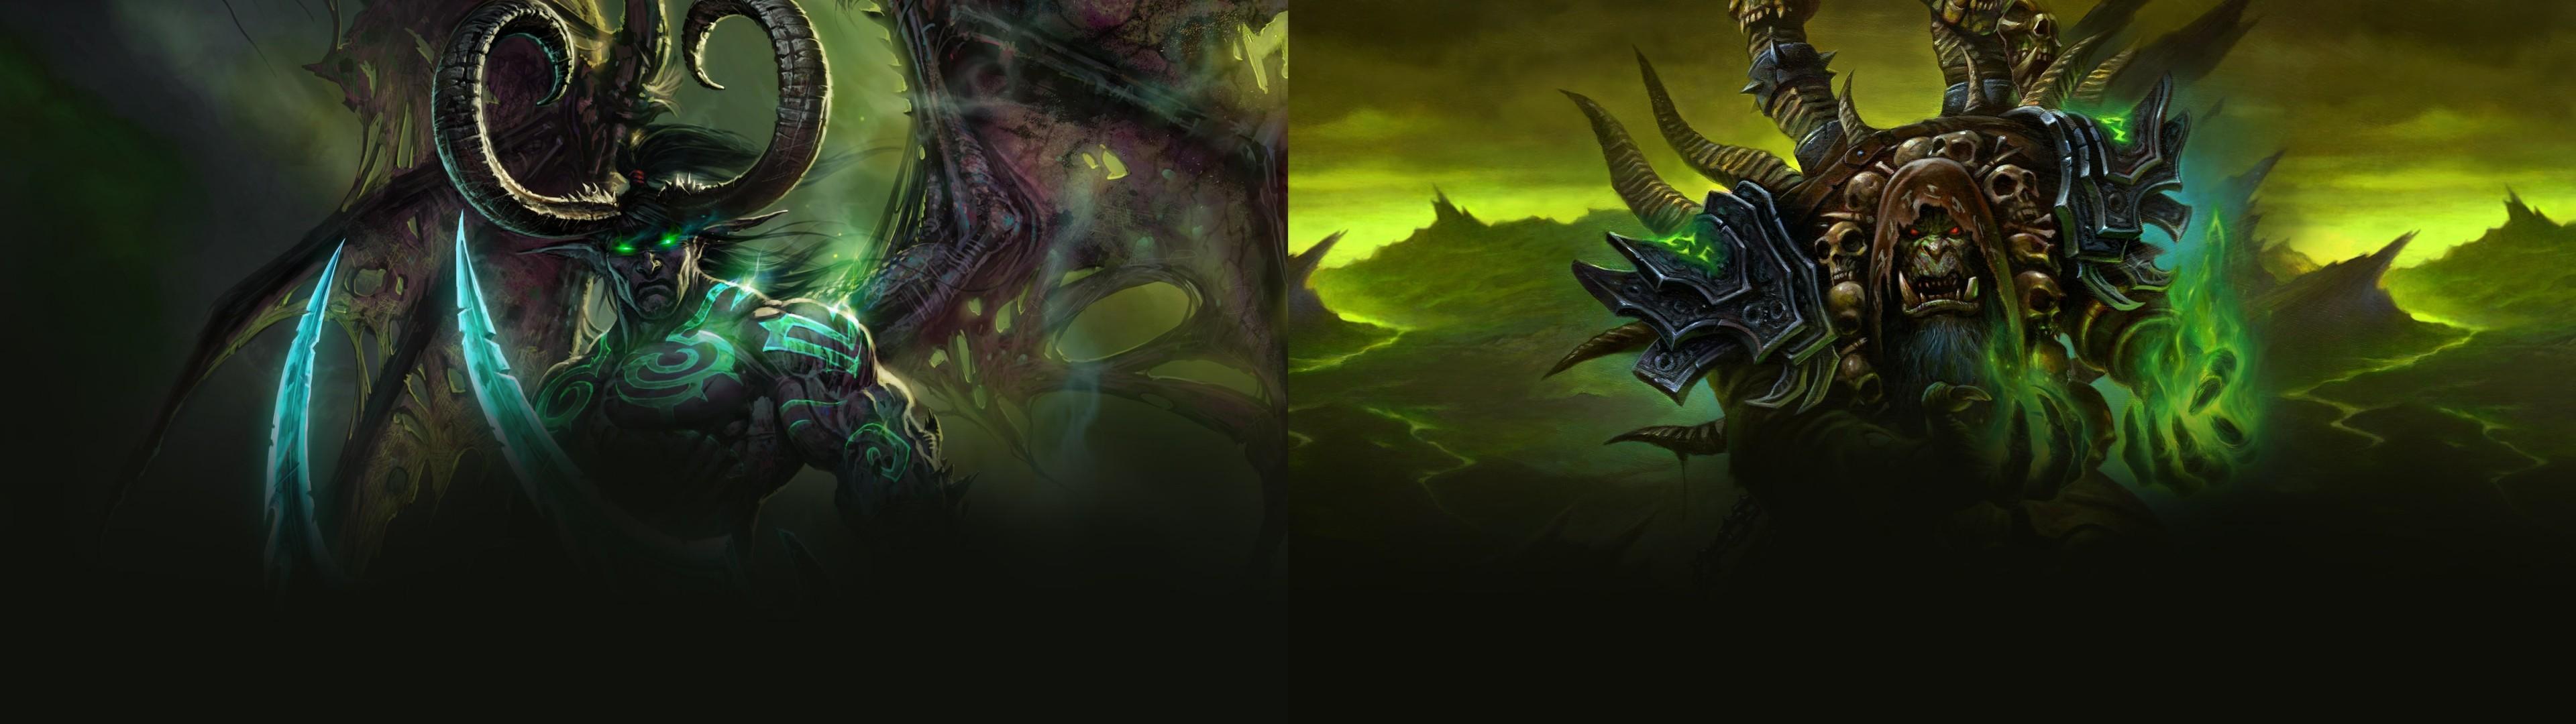 Wallpaper Sunlight Video Games Collage World Of Warcraft